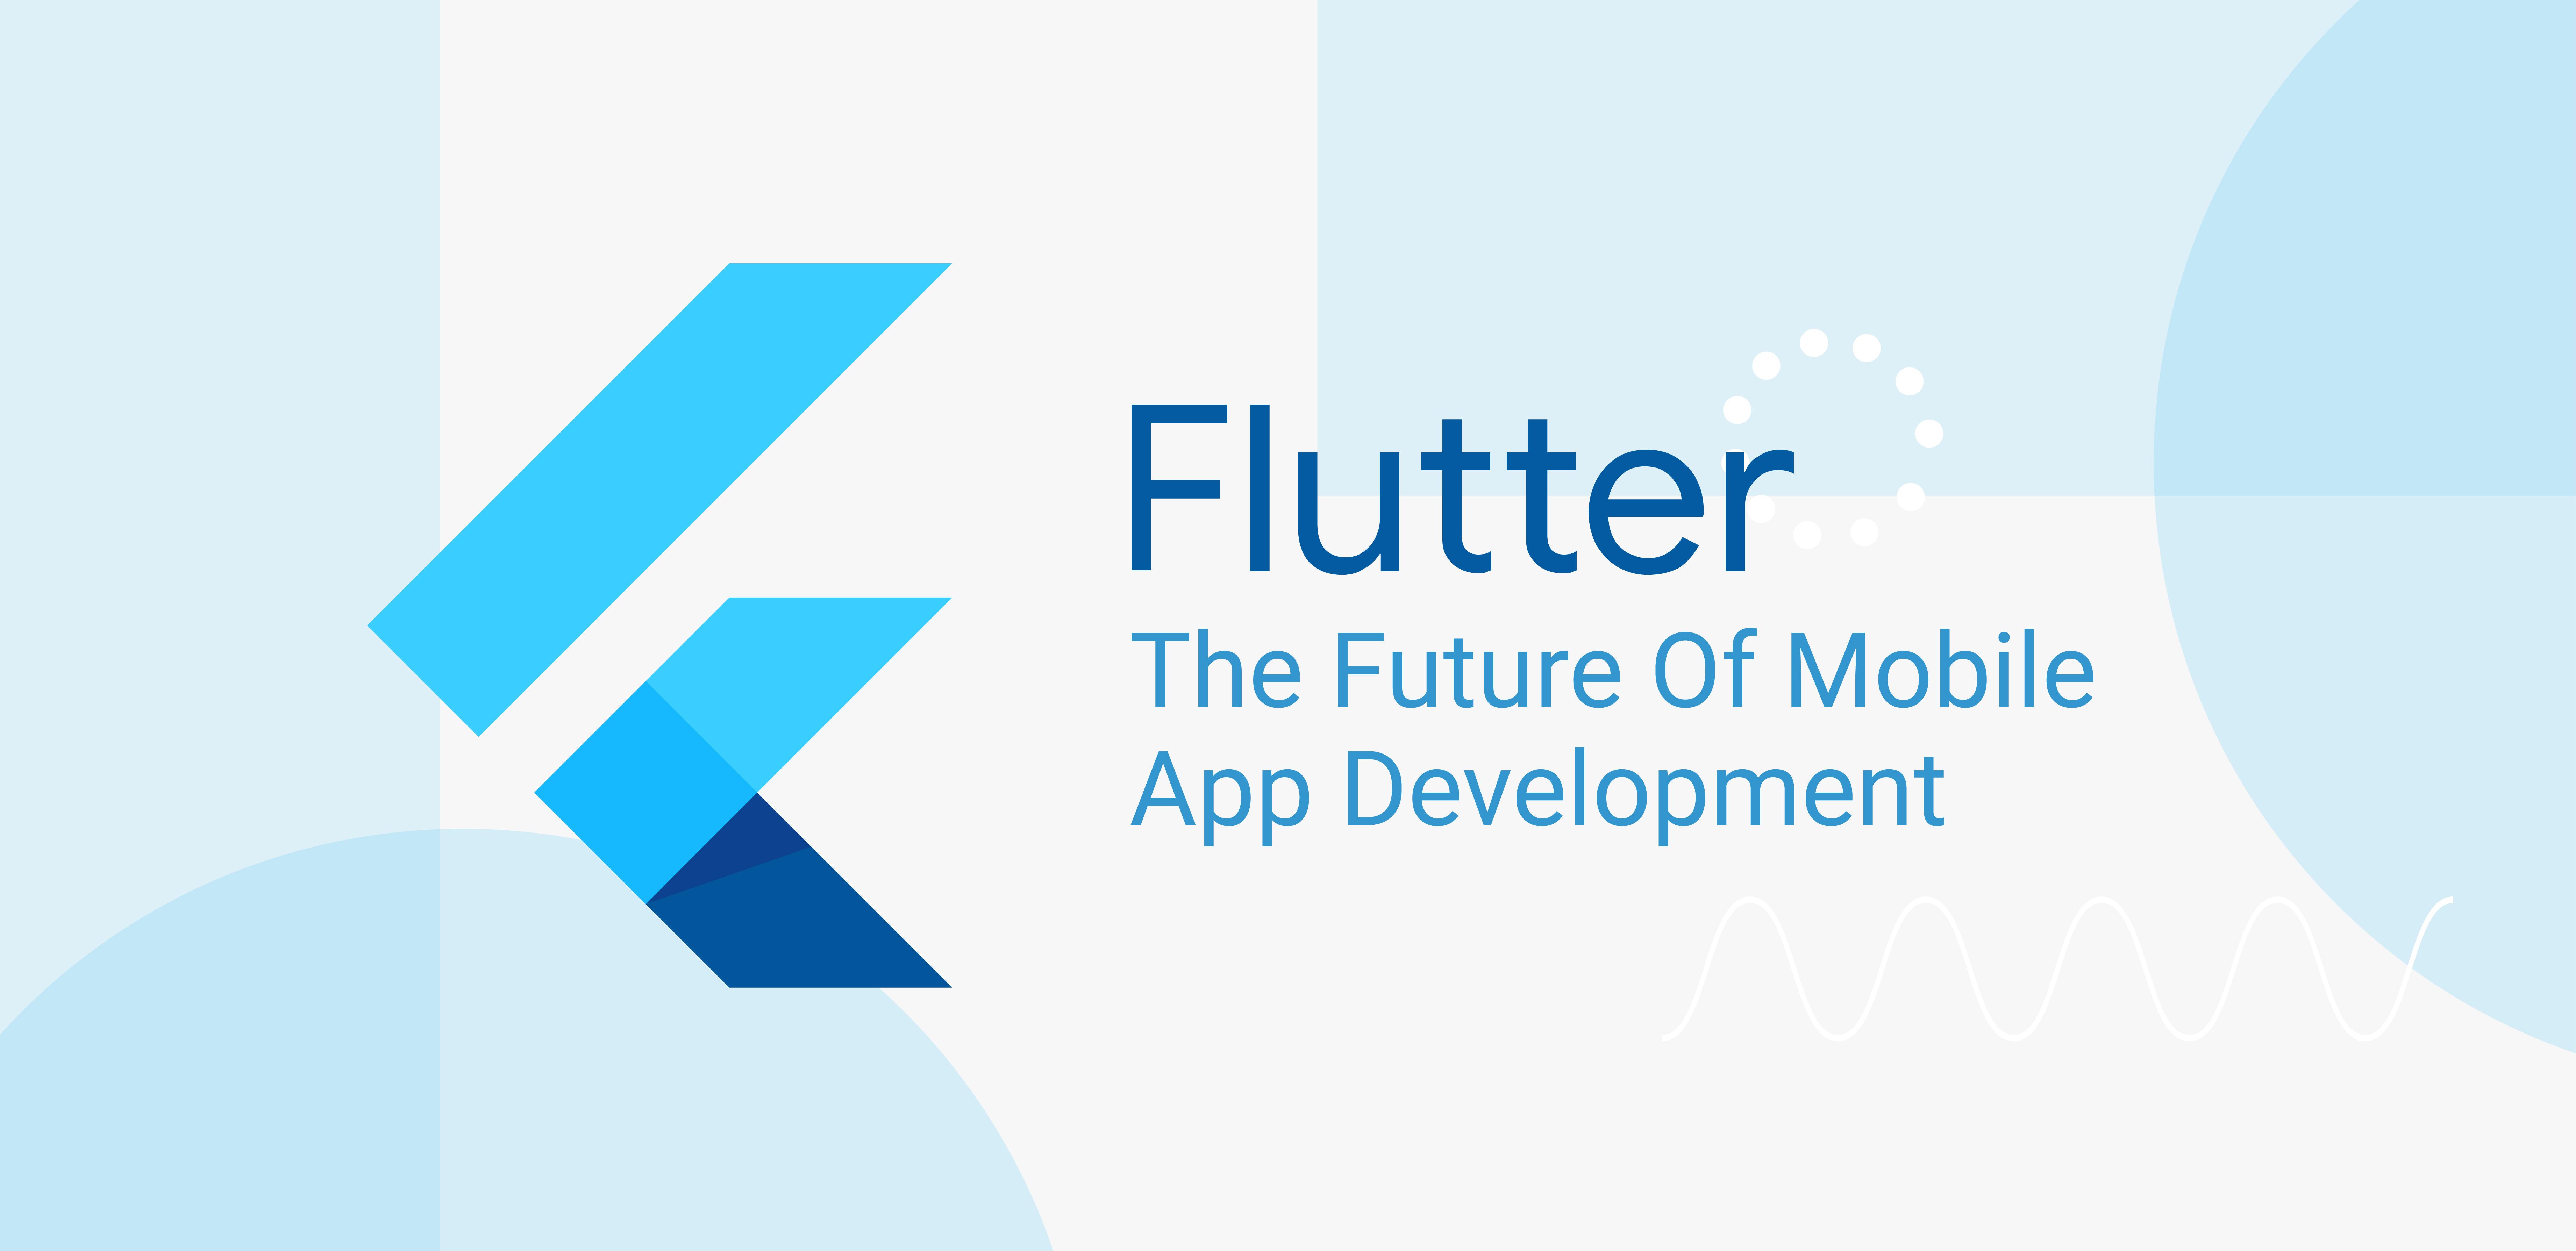 Flutter The Future Of Mobile App Development